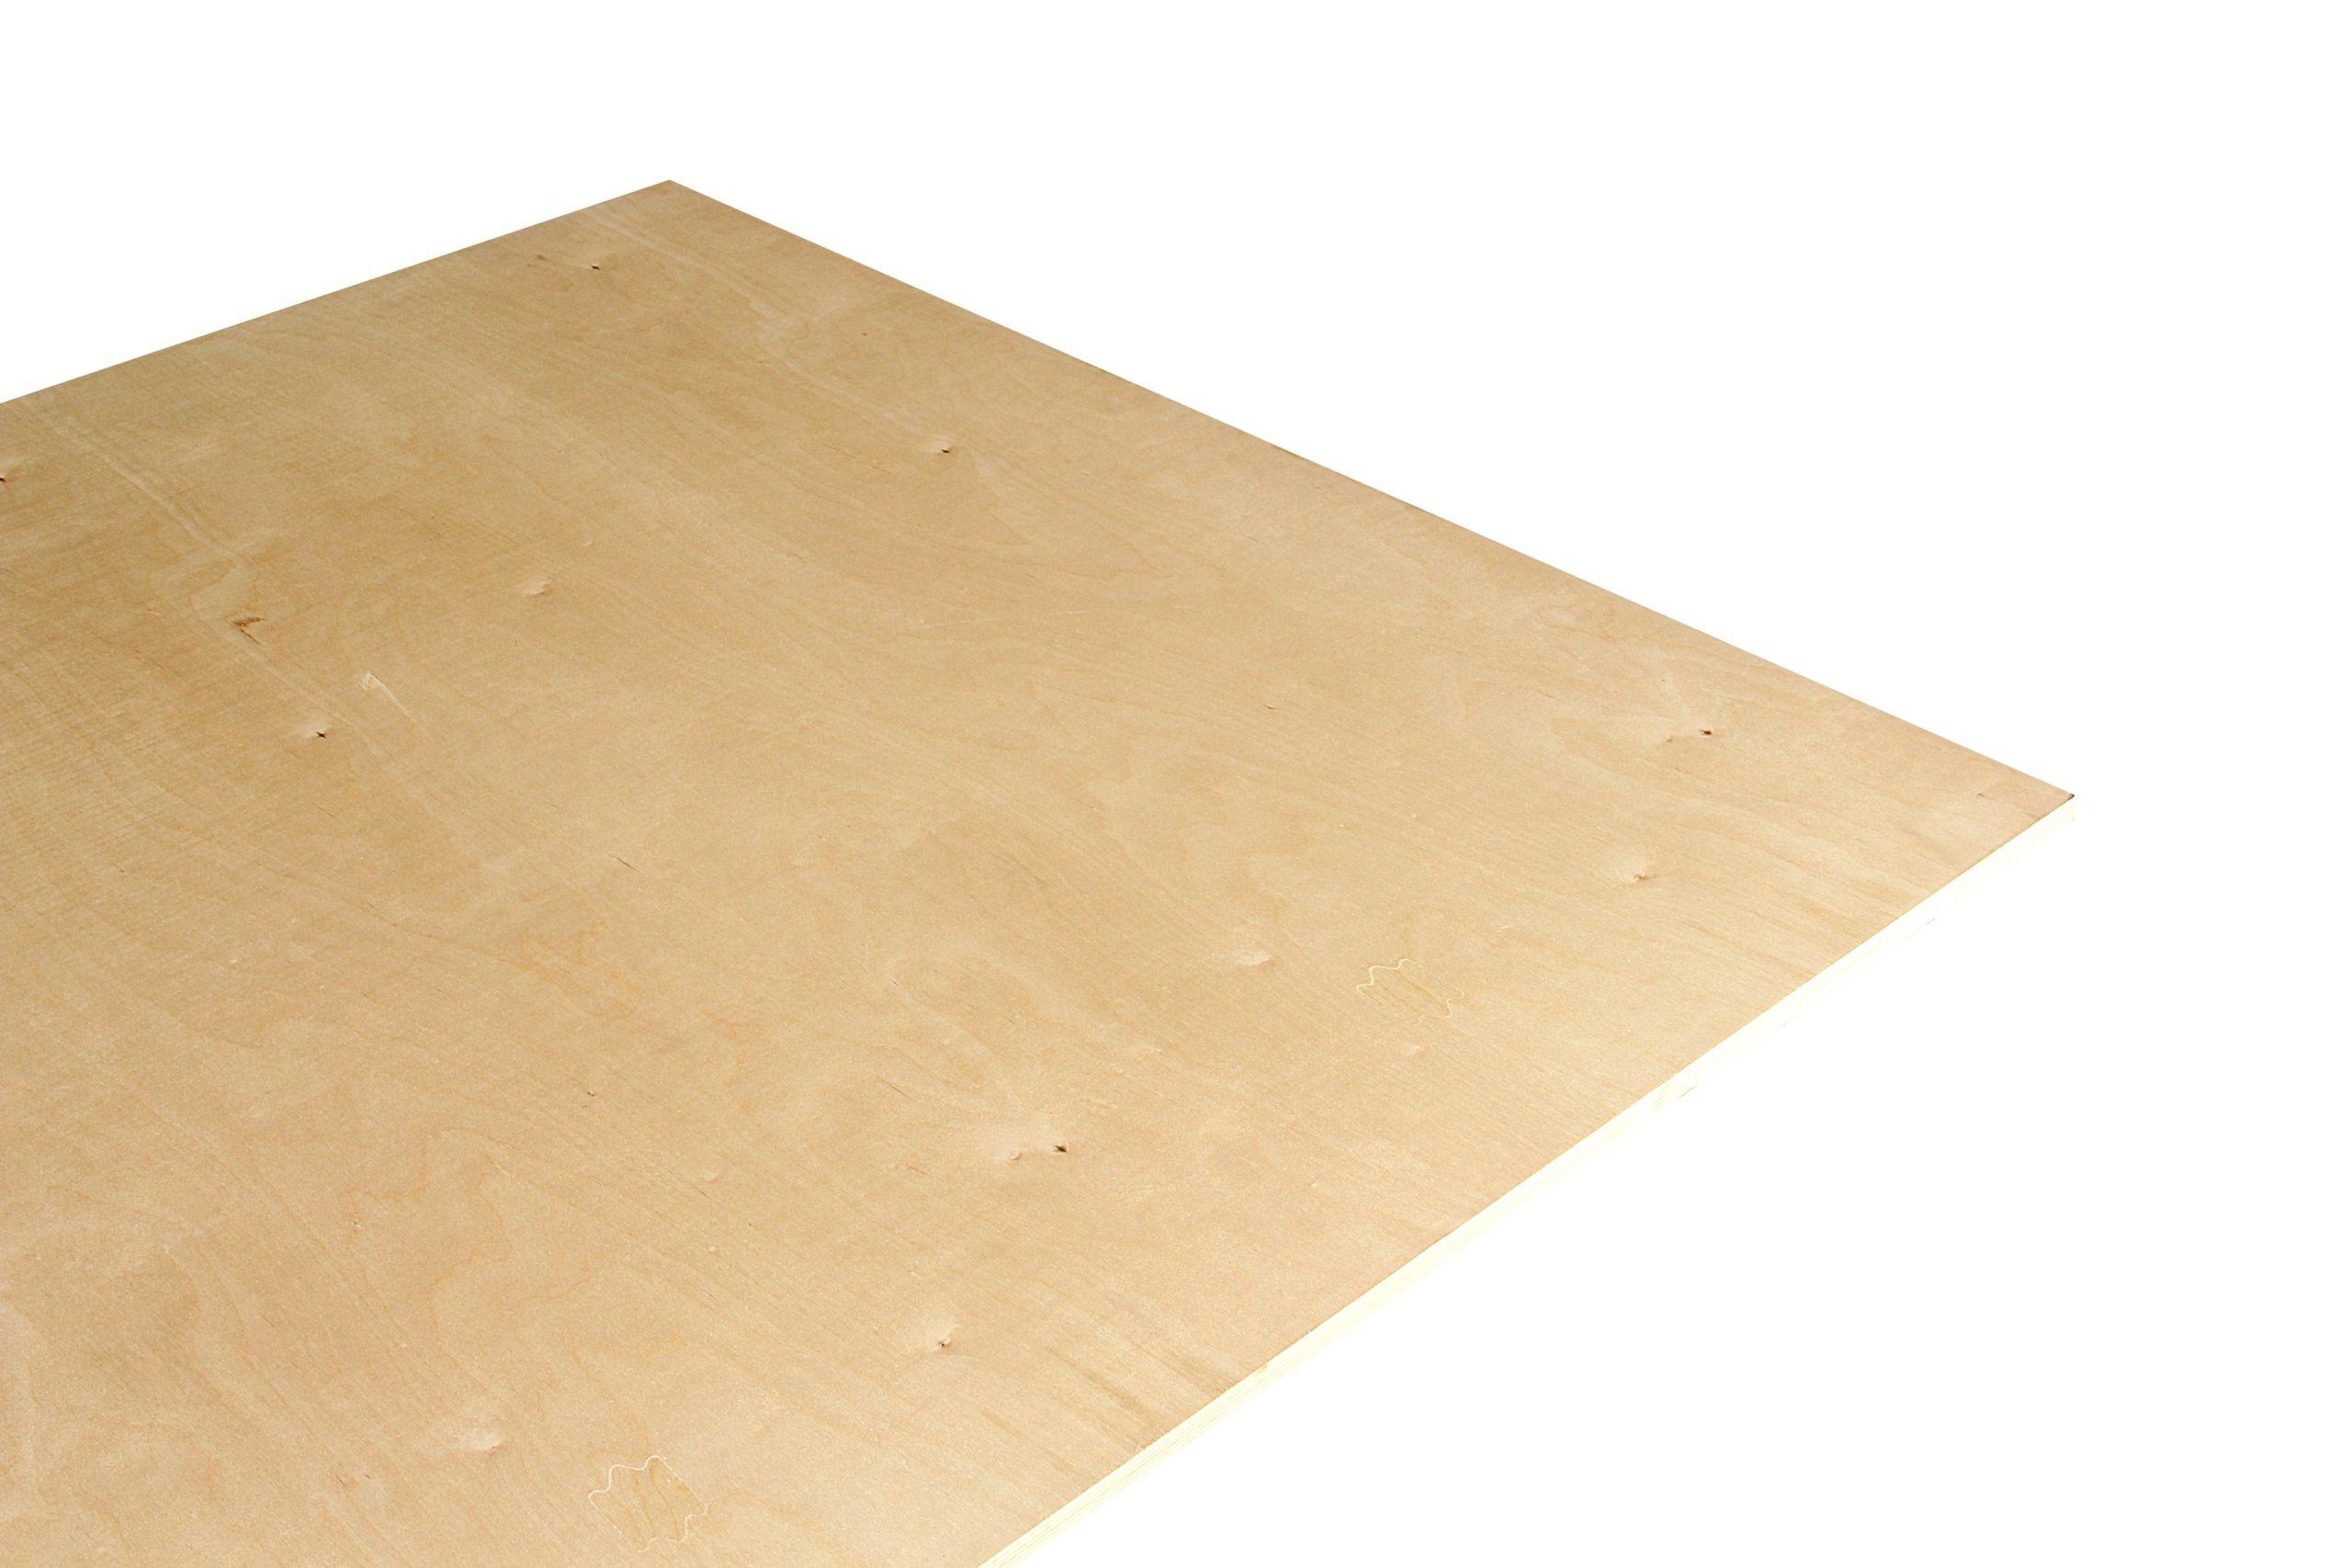 Kontrplak - Rus Birch MR Tutkallı (15mm) - 1525x1525mm-4677